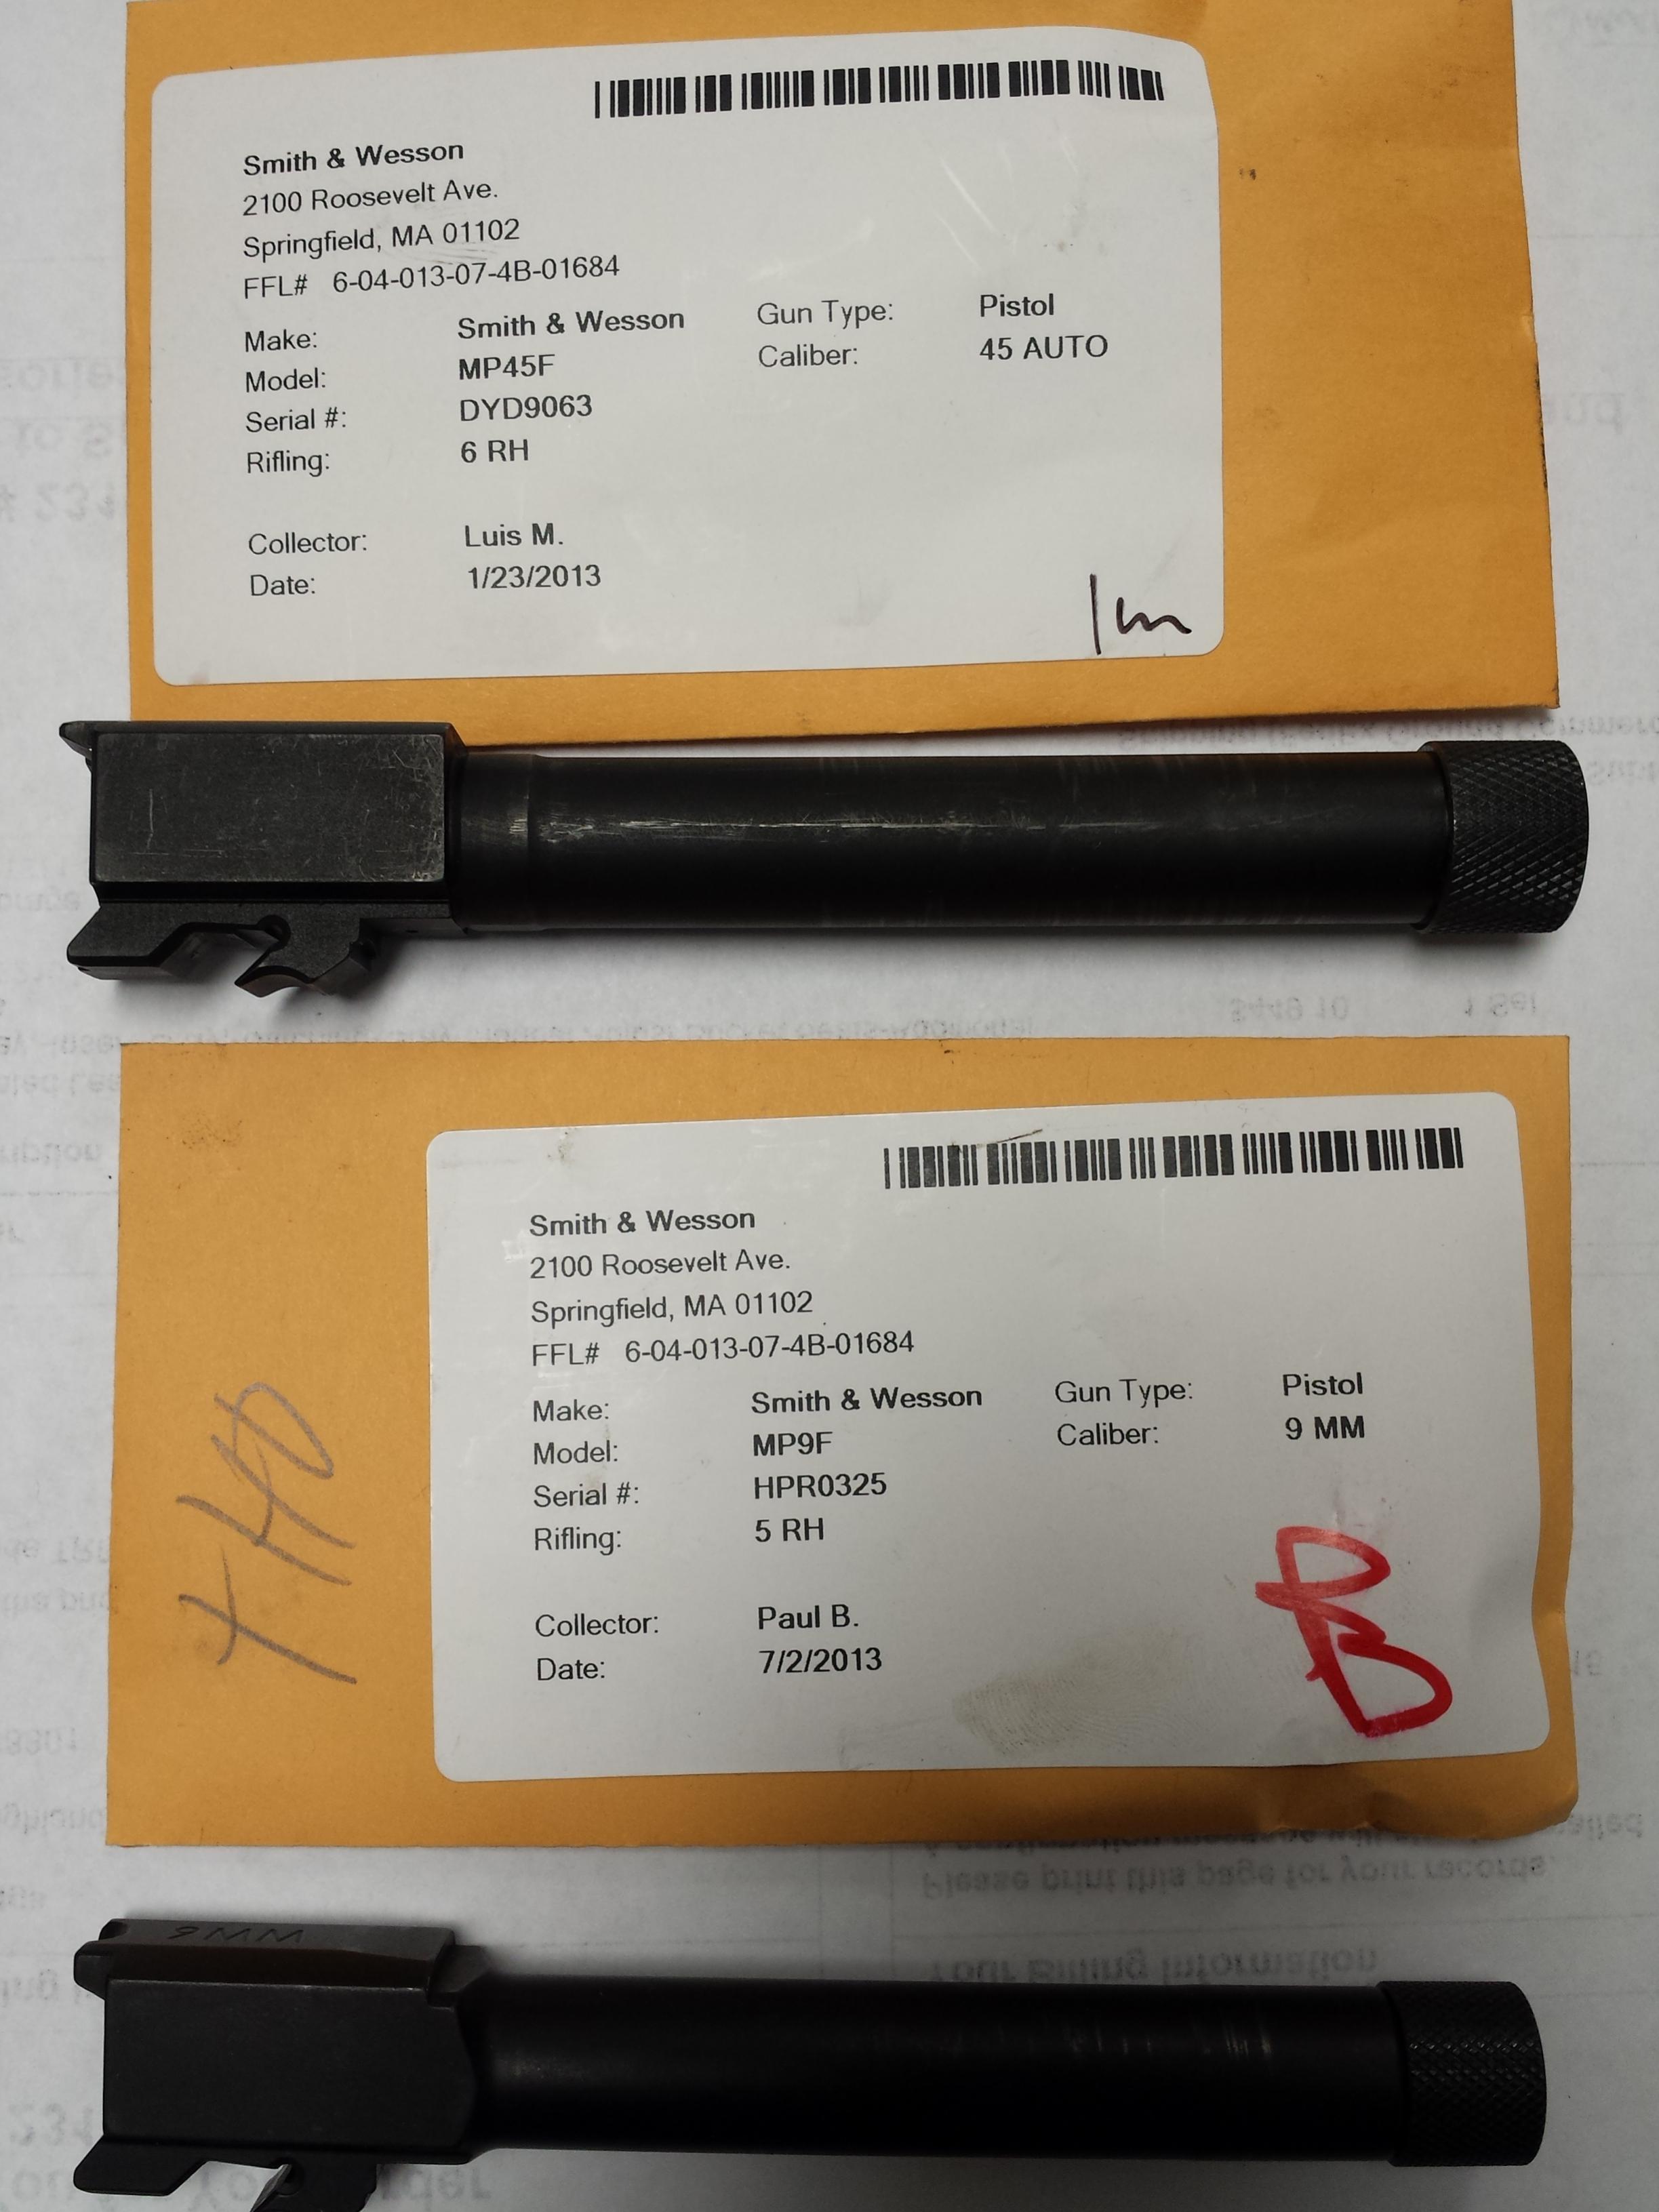 Smith & Wesson M&P Threaded Barrels .45 & 9mm-20131211_171928.jpg